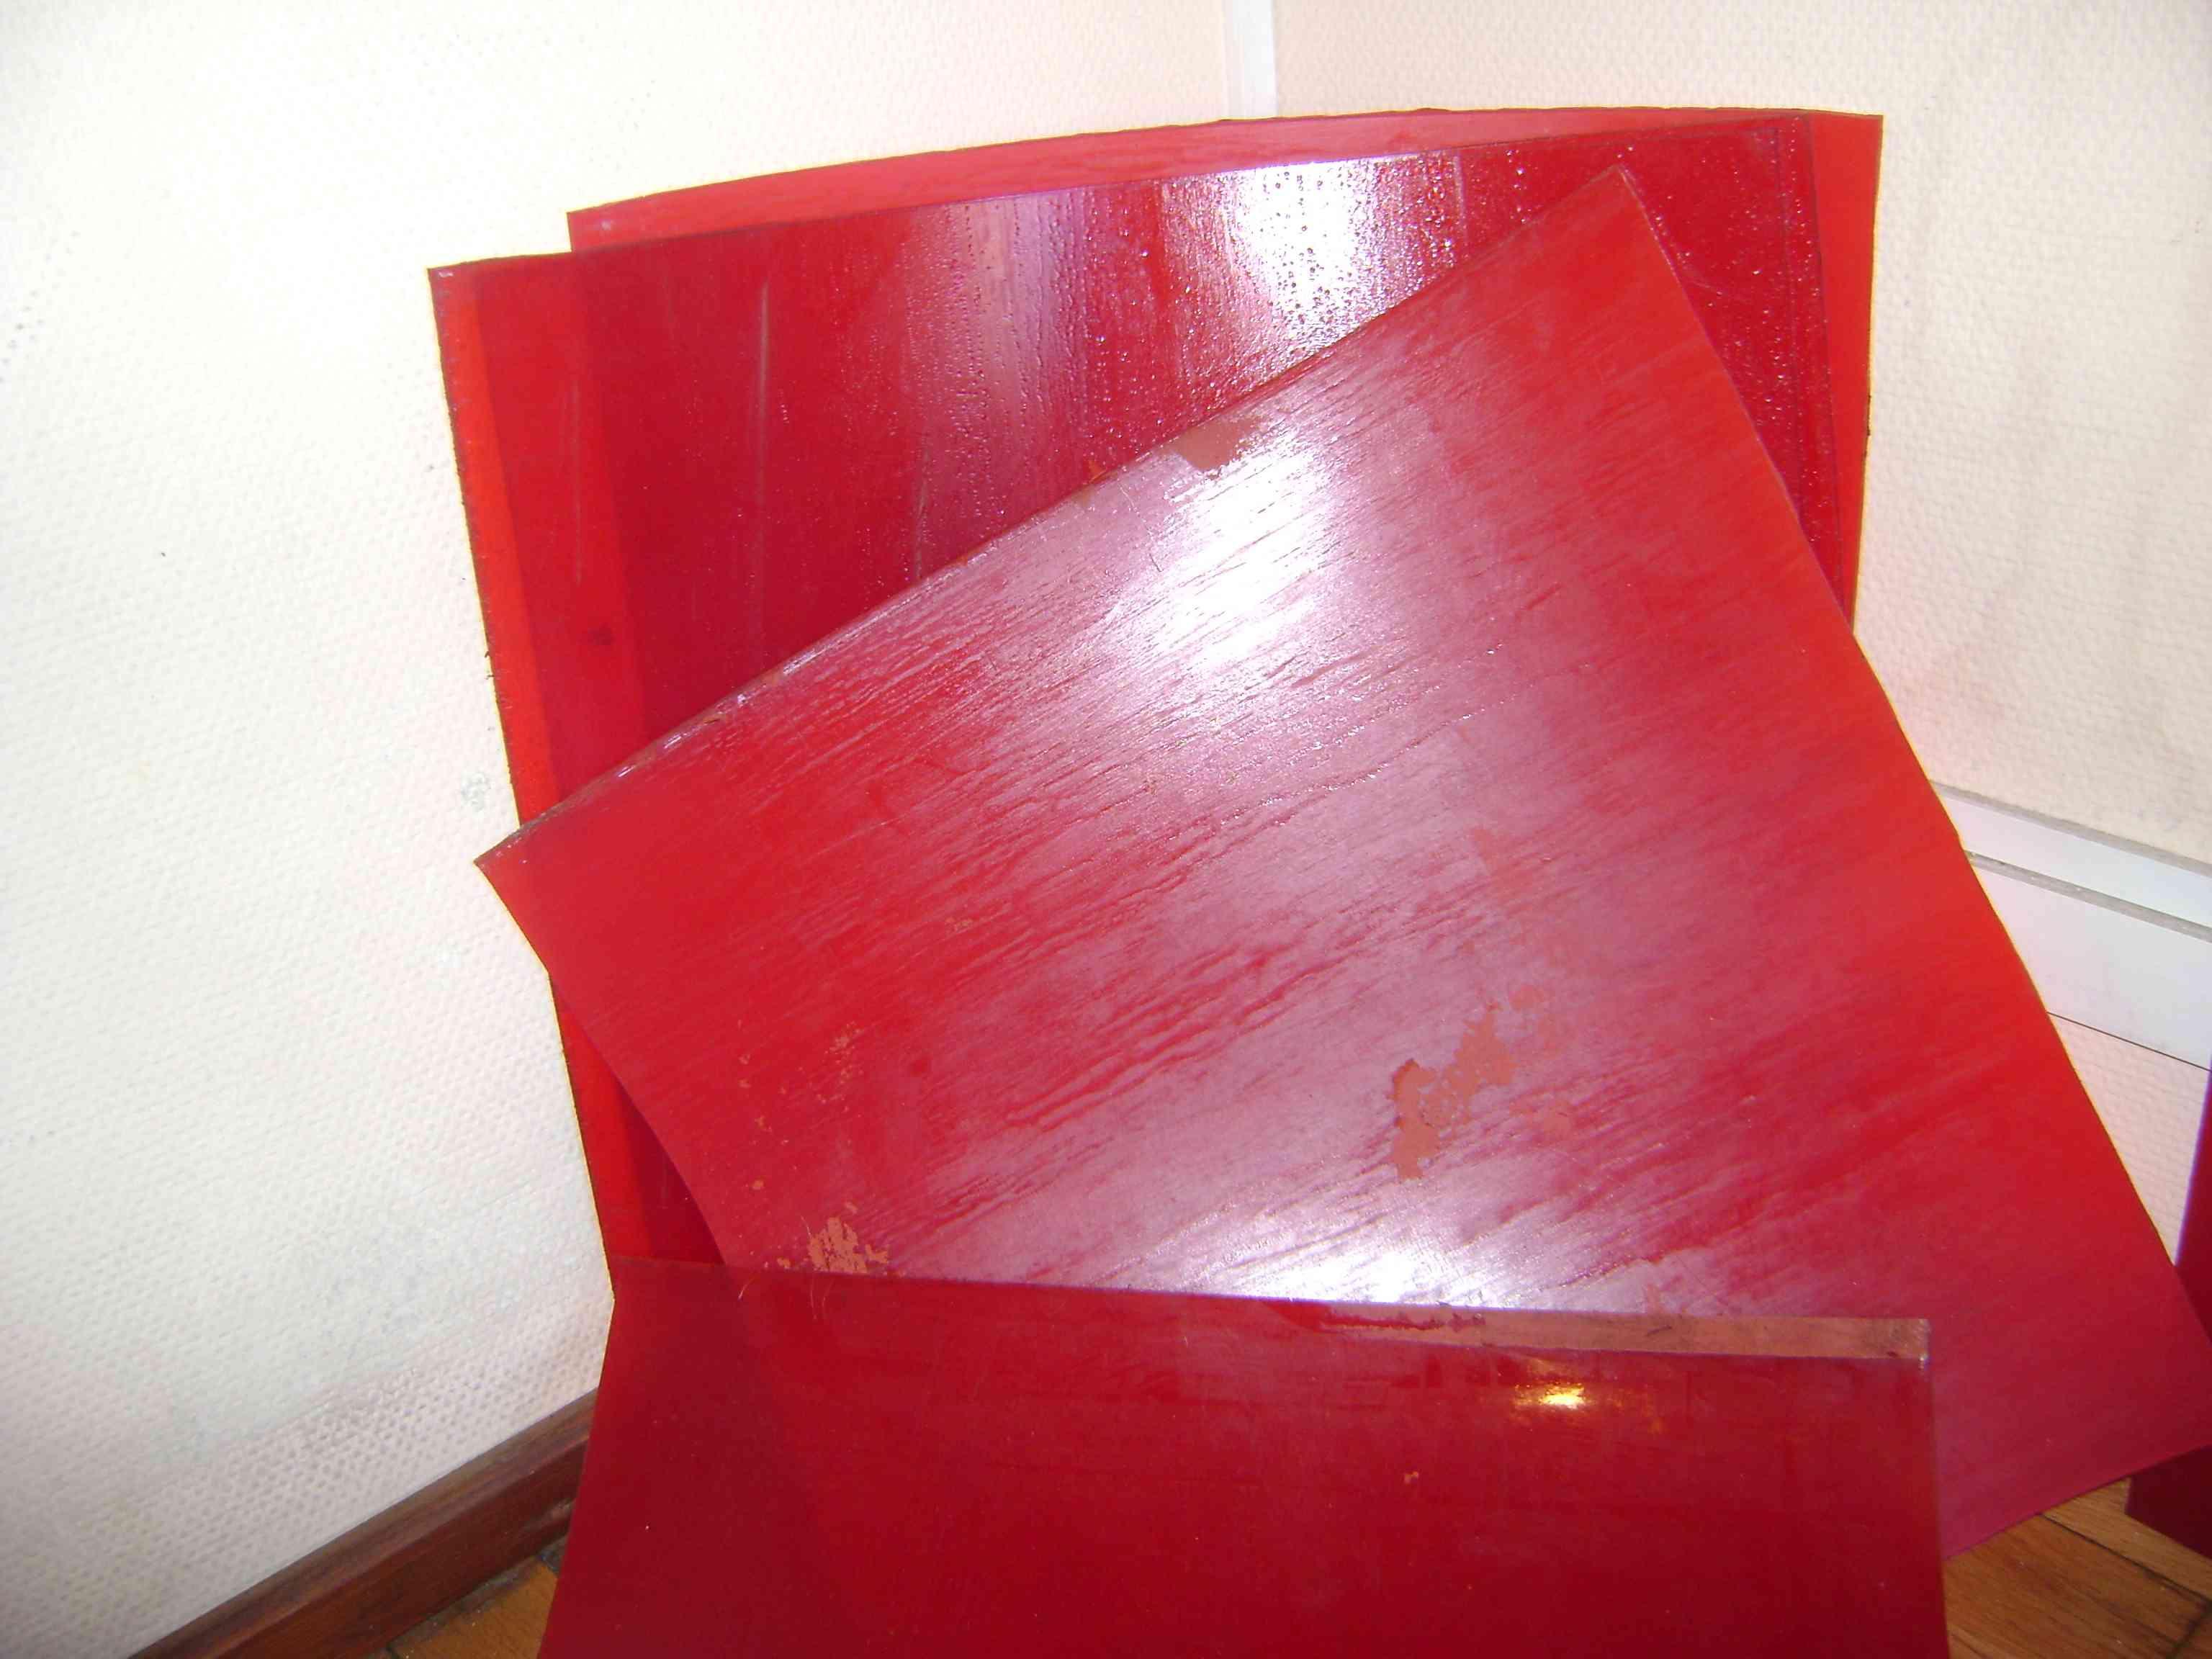 Пластина полиуретановая 500х500х20 мм Твердость 85-90 ед Шор